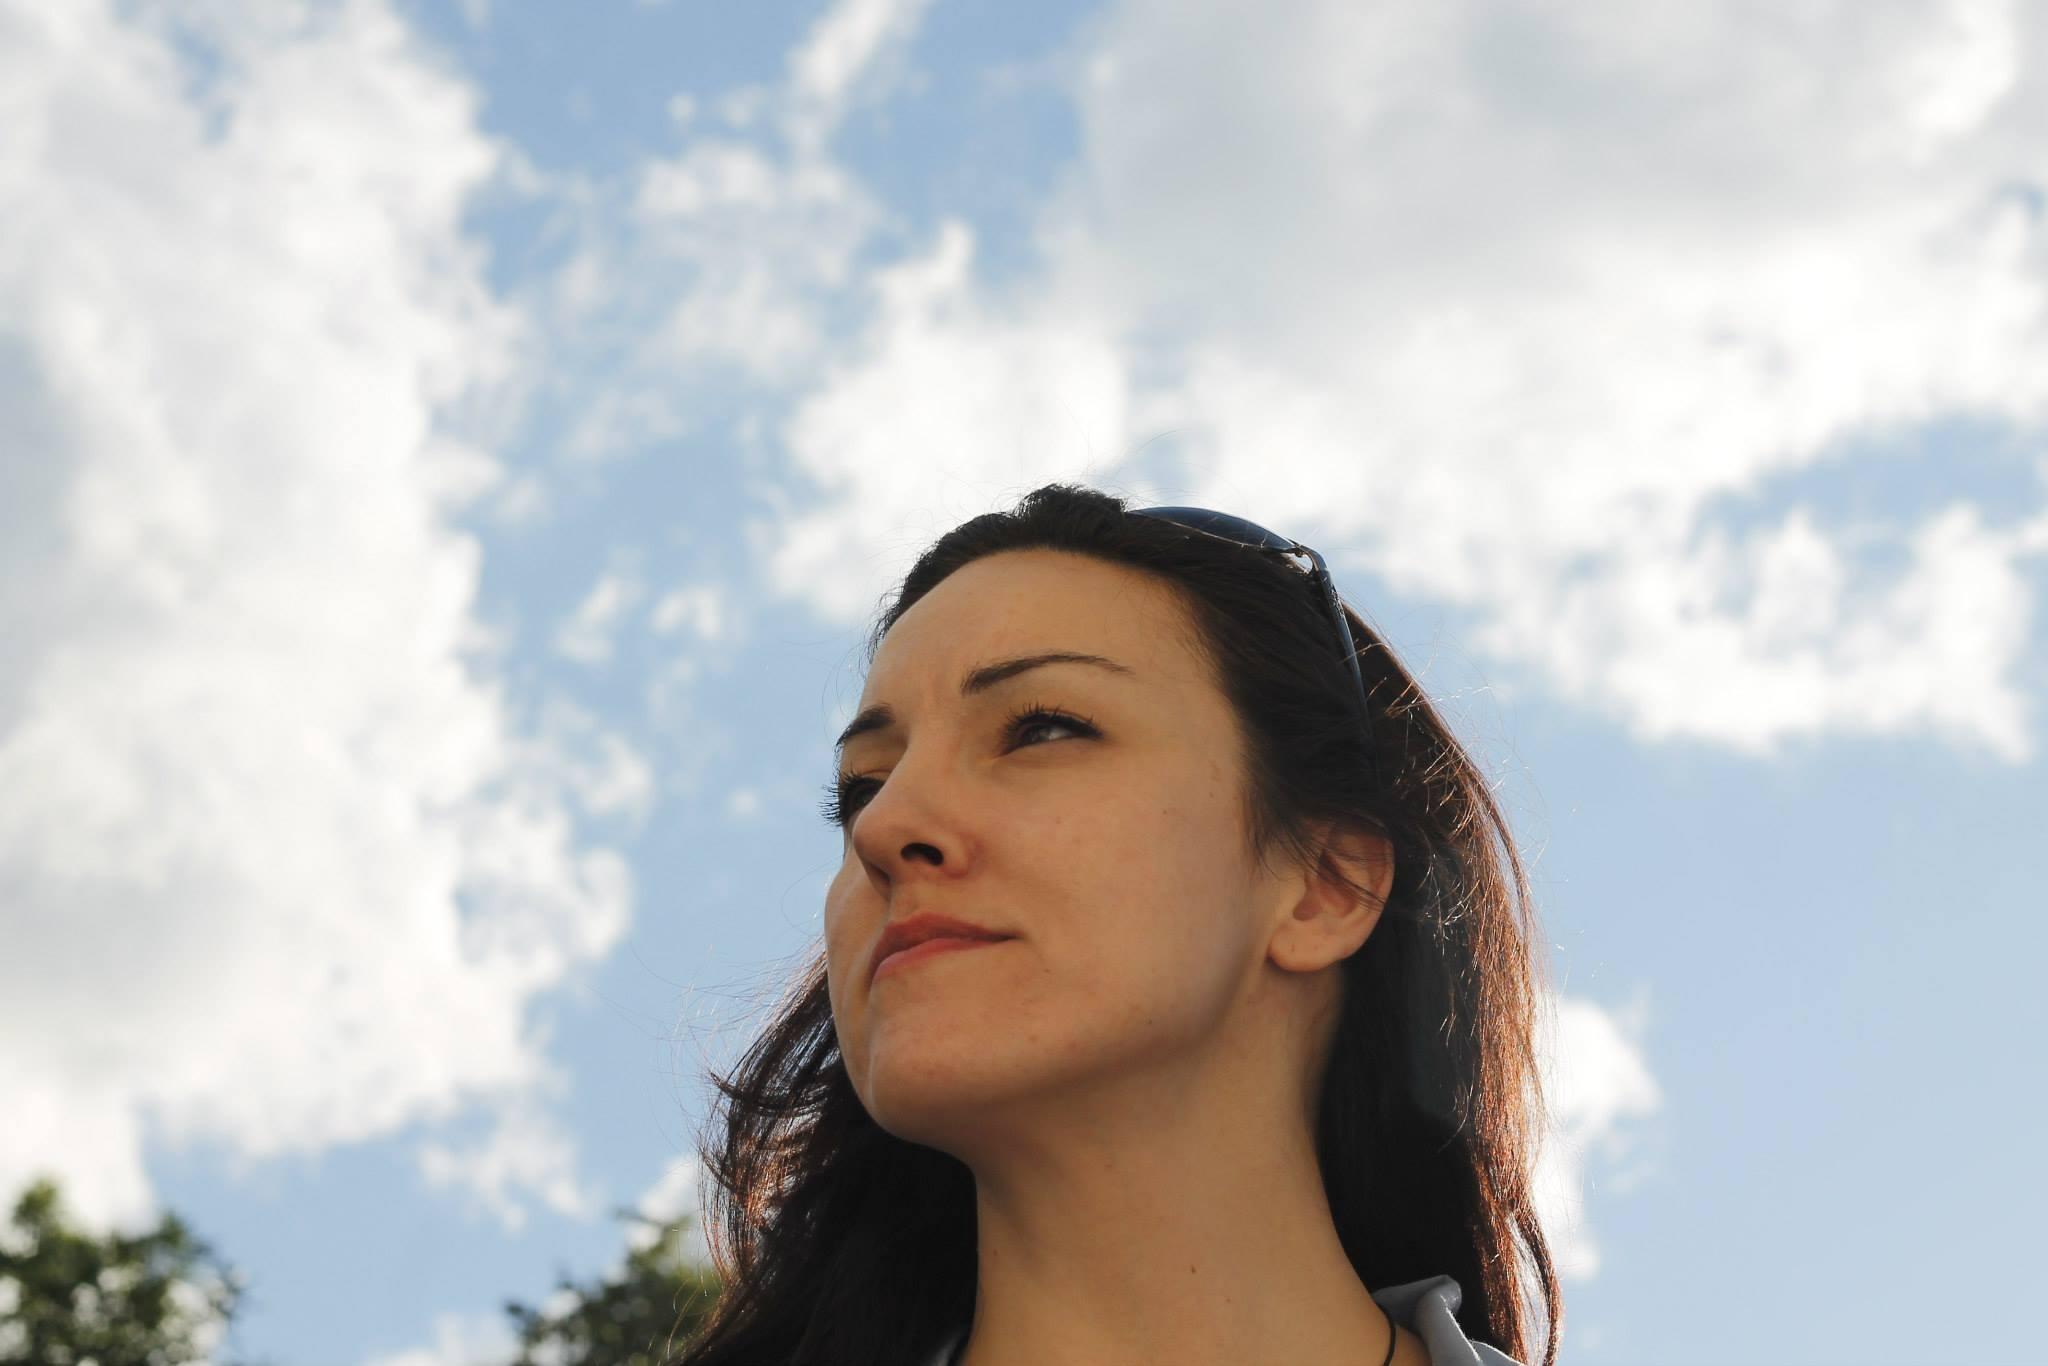 A face, a sky by Daron